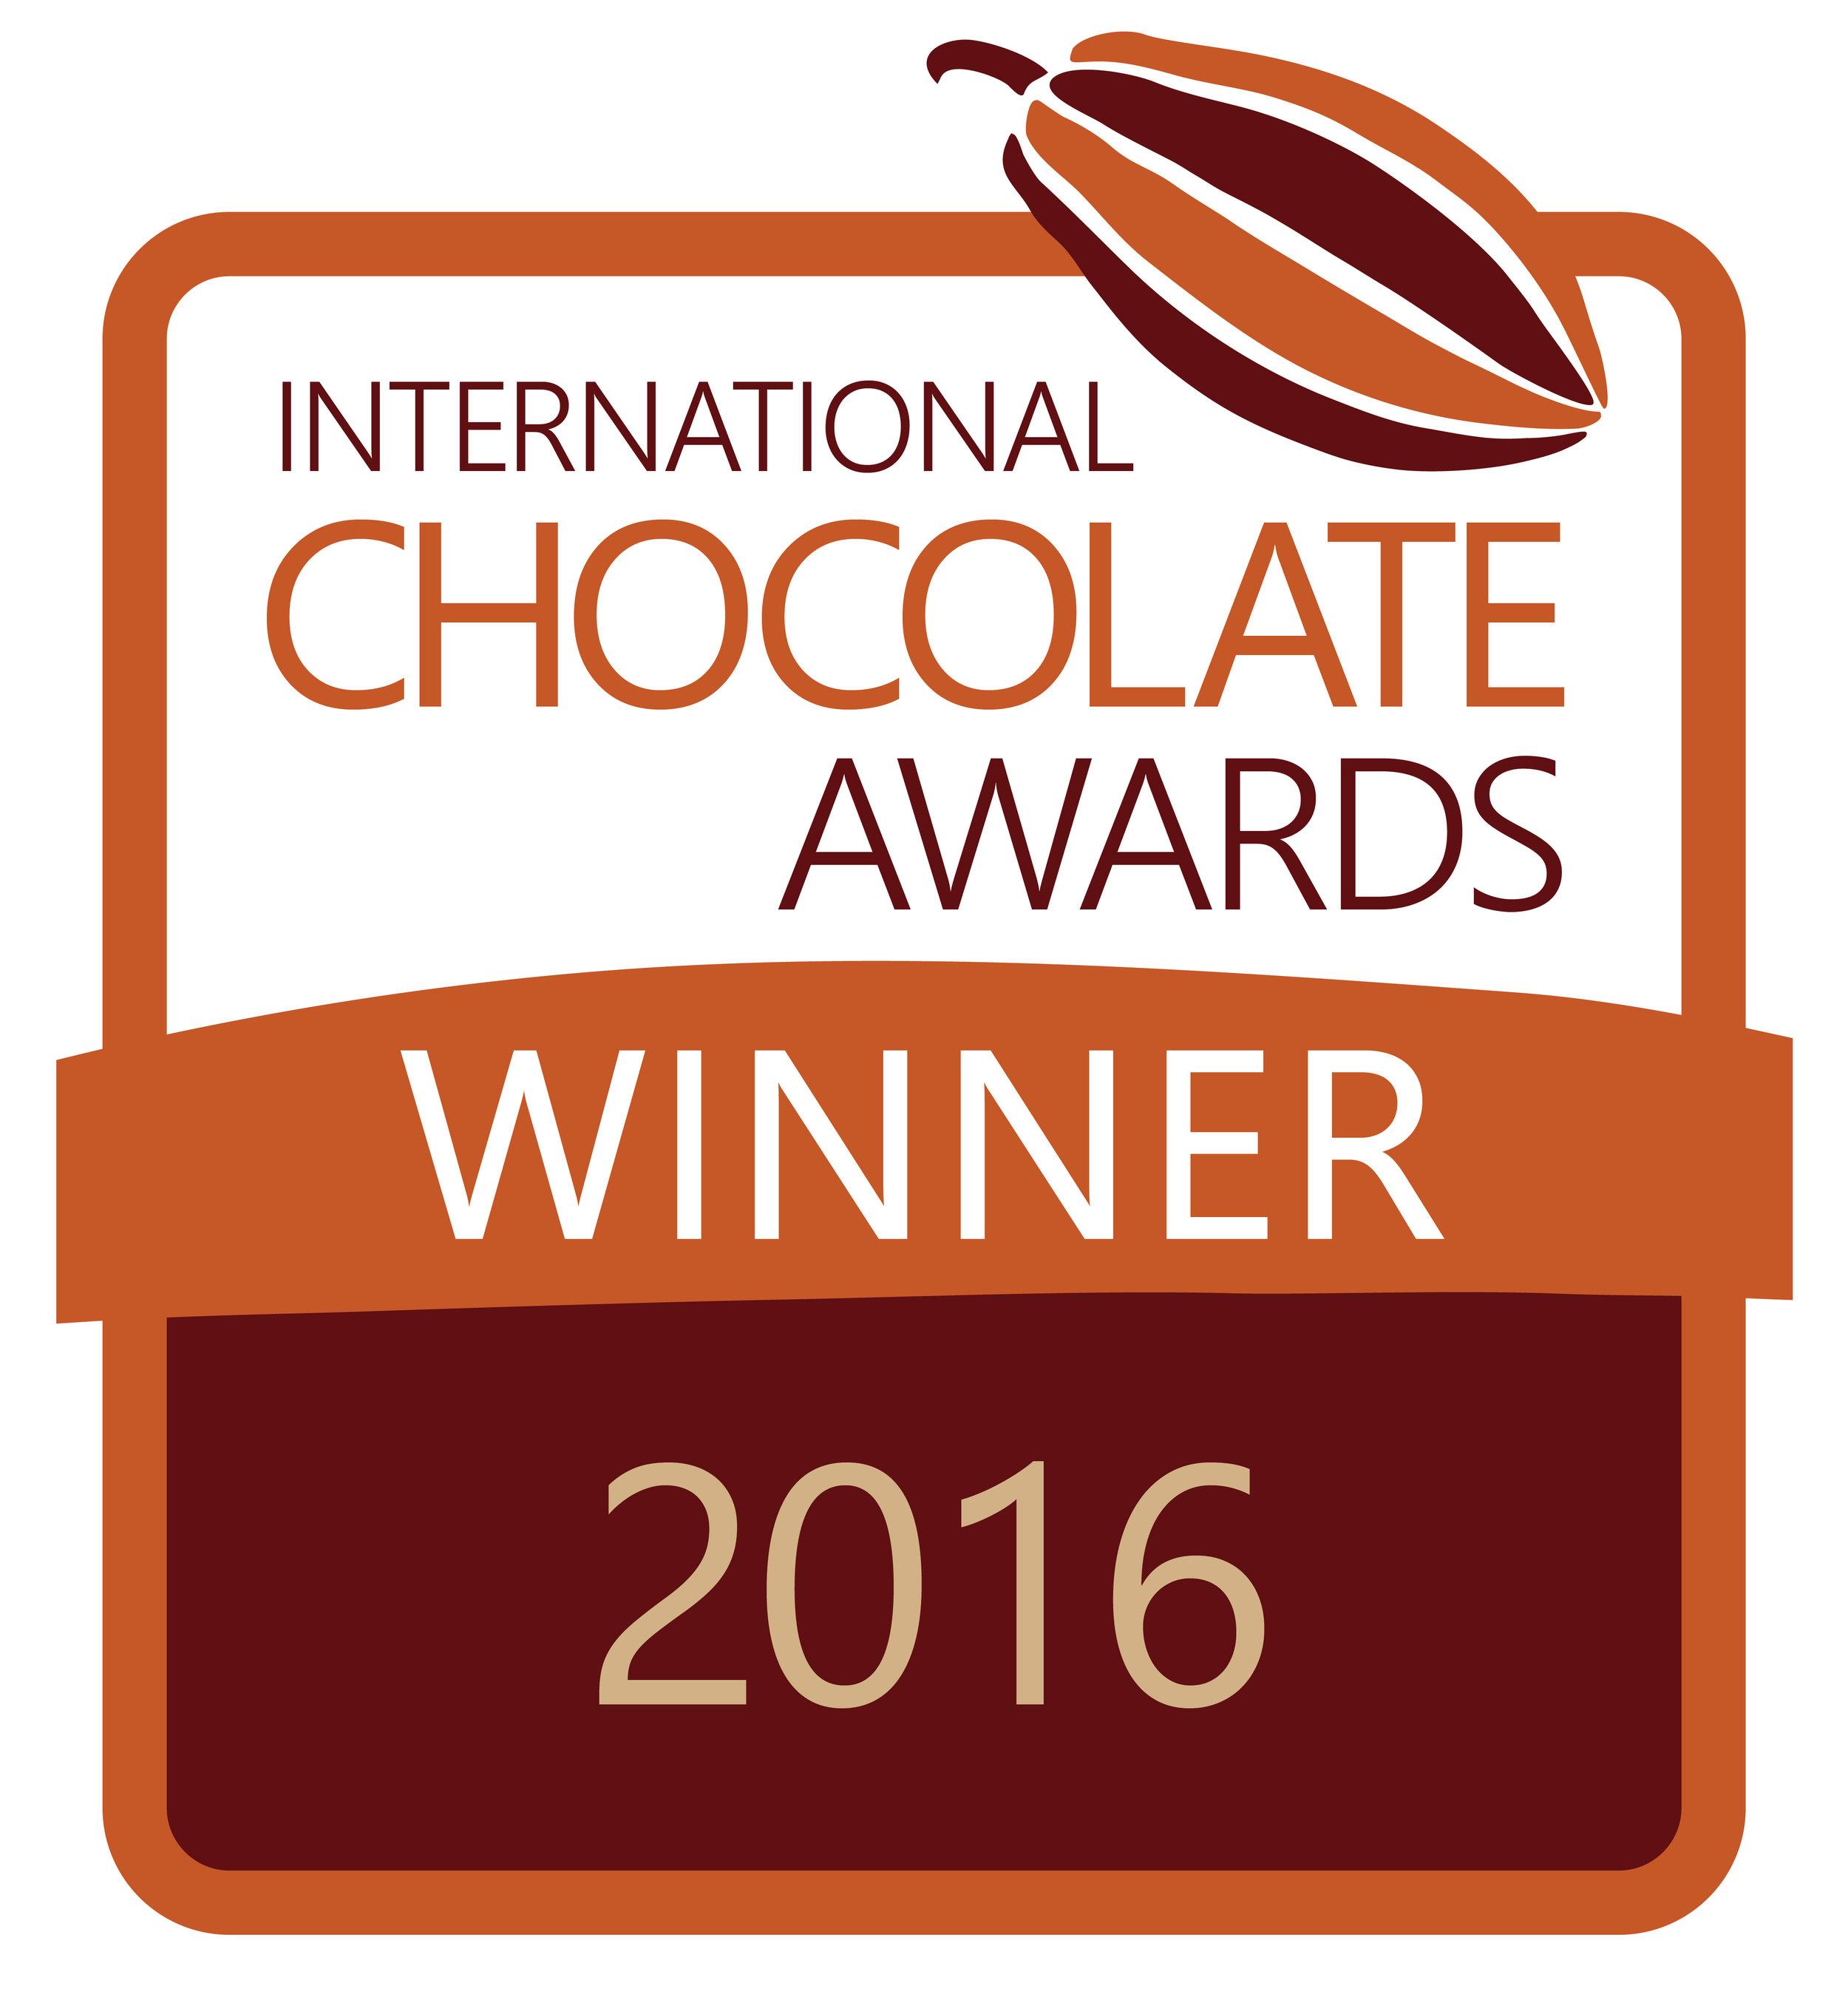 ica-prize-logo-2016-winner-rgb.jpg